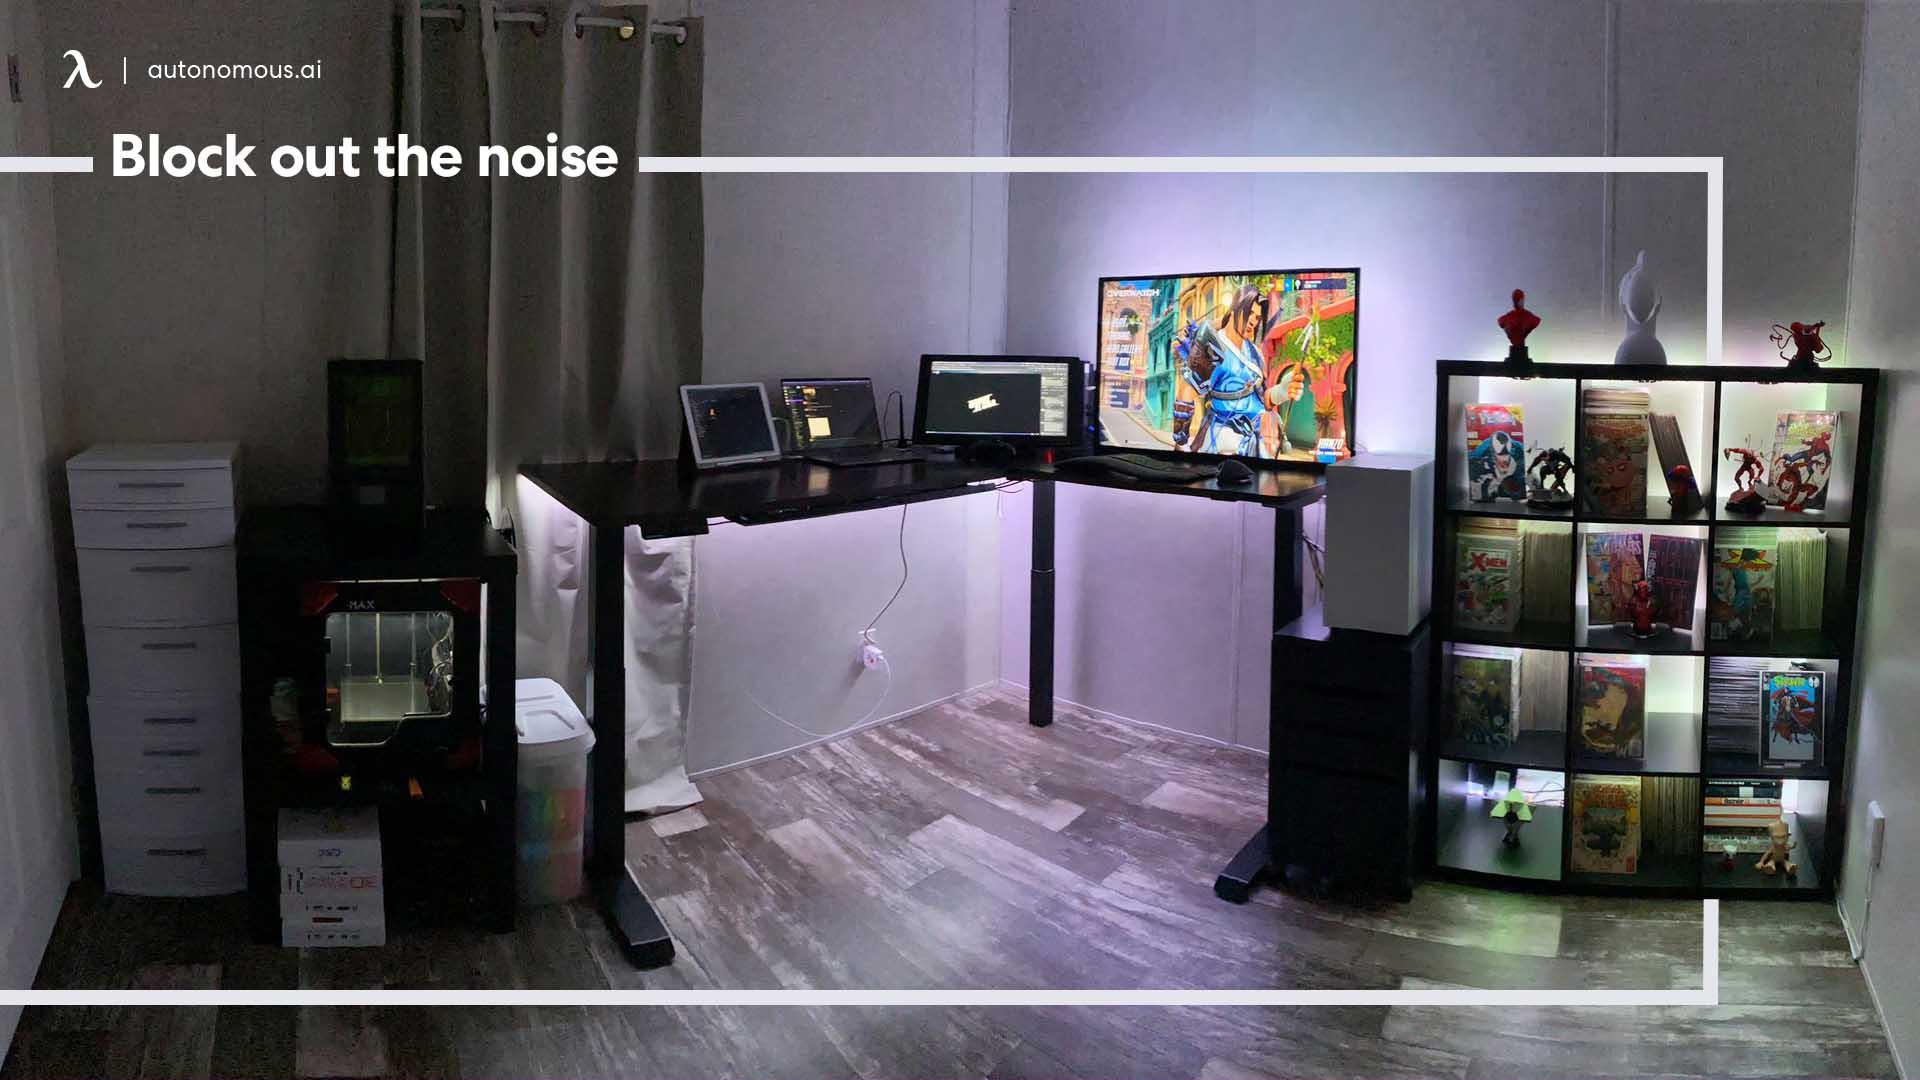 Setup productive desk with noise blocking accessories